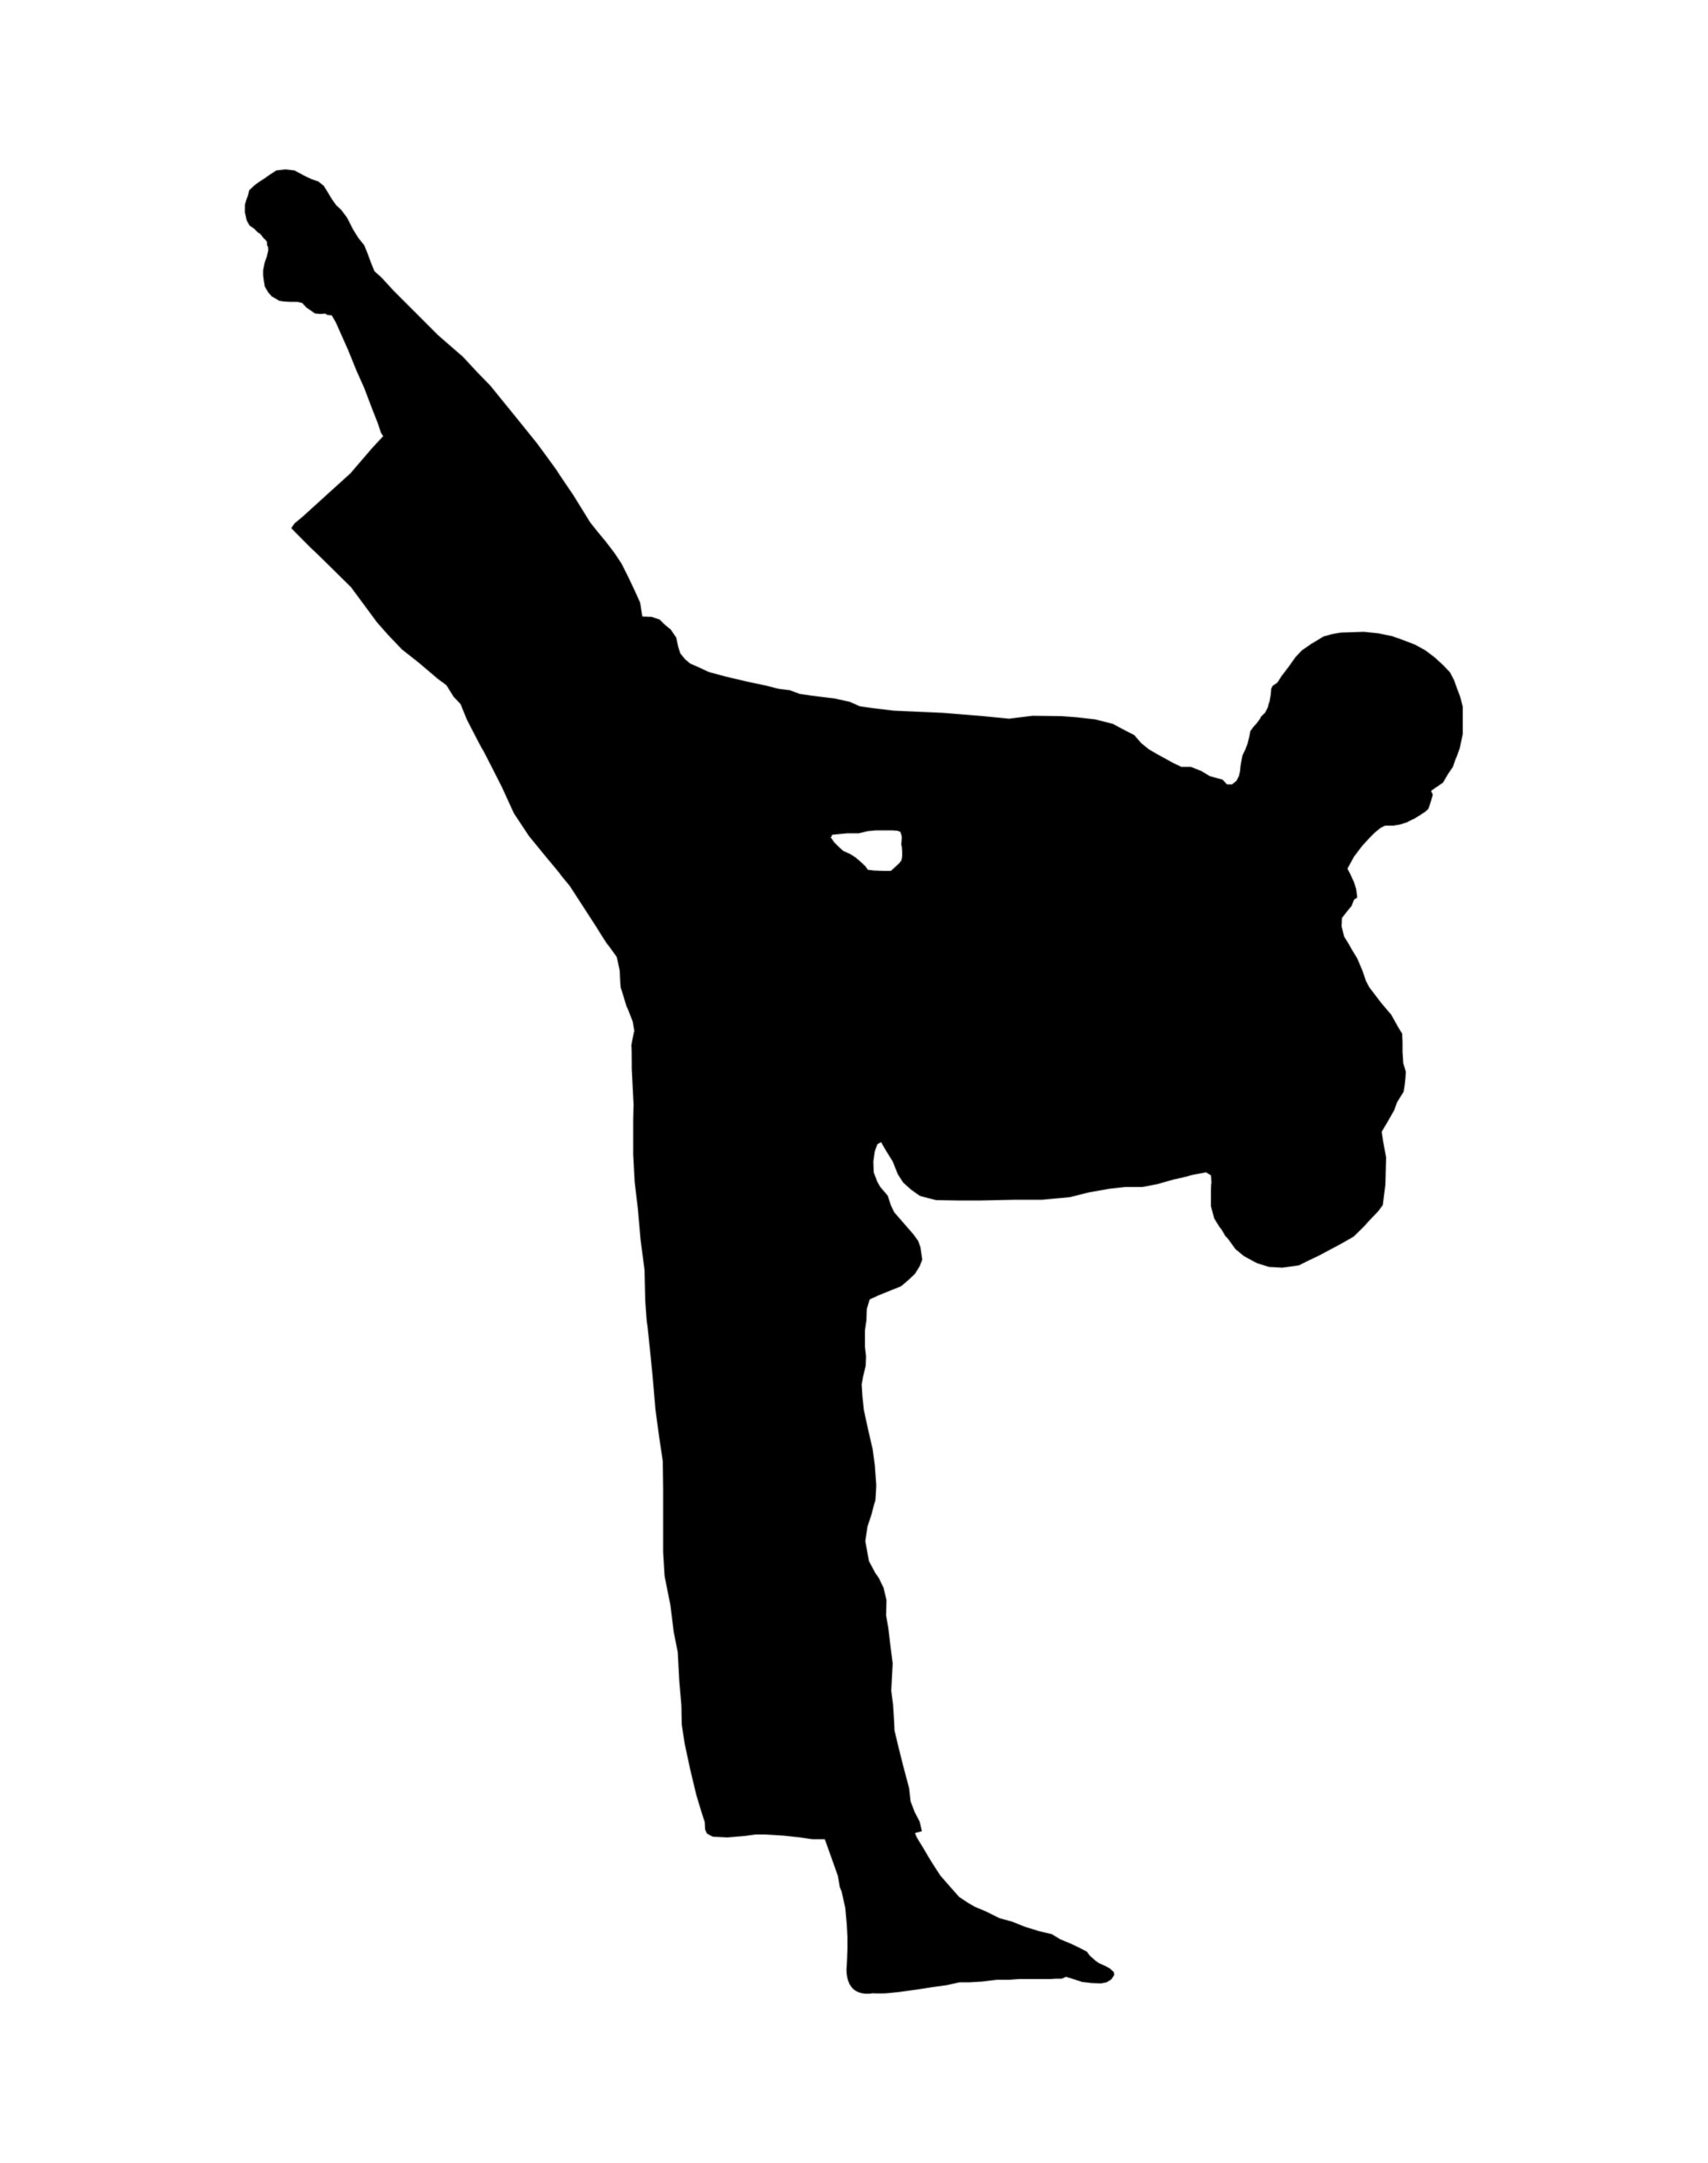 Free Martial Arts Clipart, Download Free Clip Art, Free Clip.